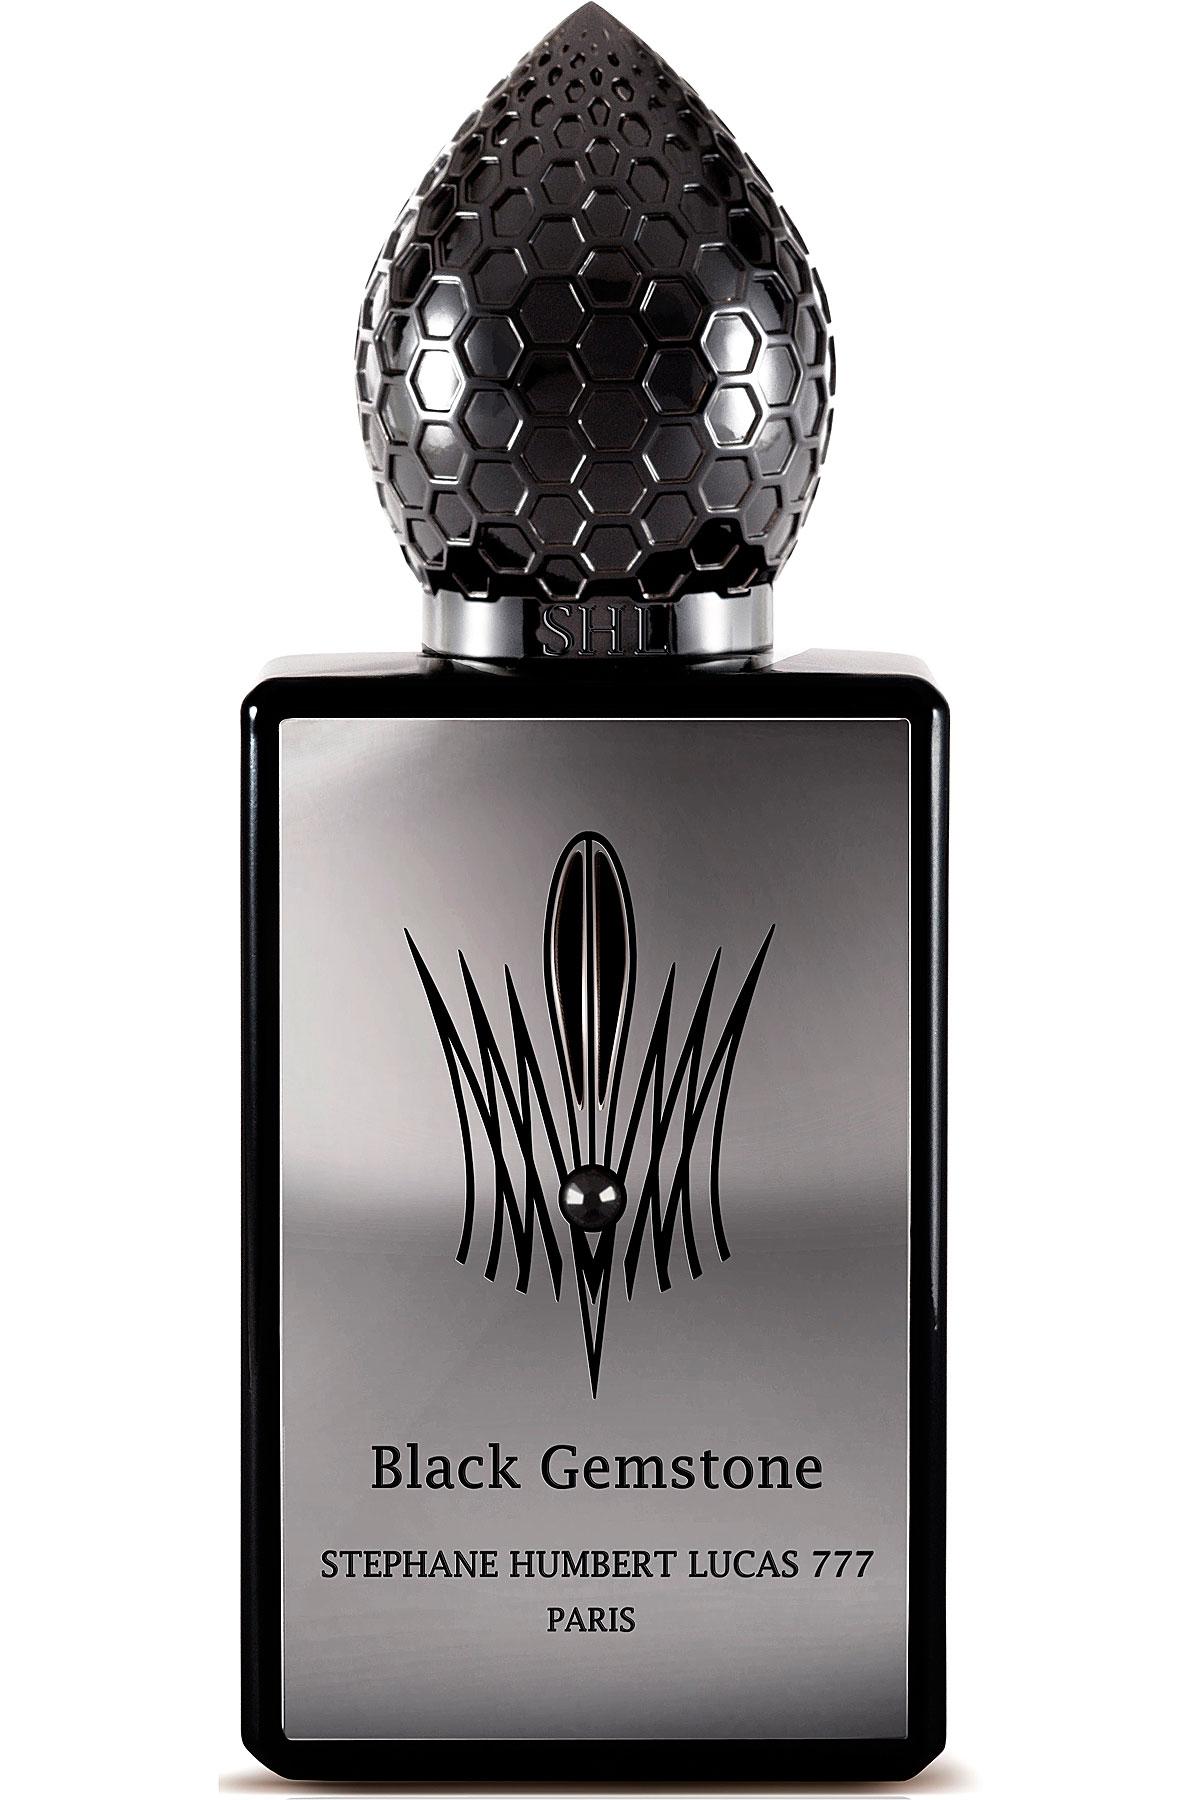 Stephane Humbert Lucas 777 Paris Fragrances for Women, Black Gemstone - Eau De Parfum - 50 Ml, 2019, 50 ml